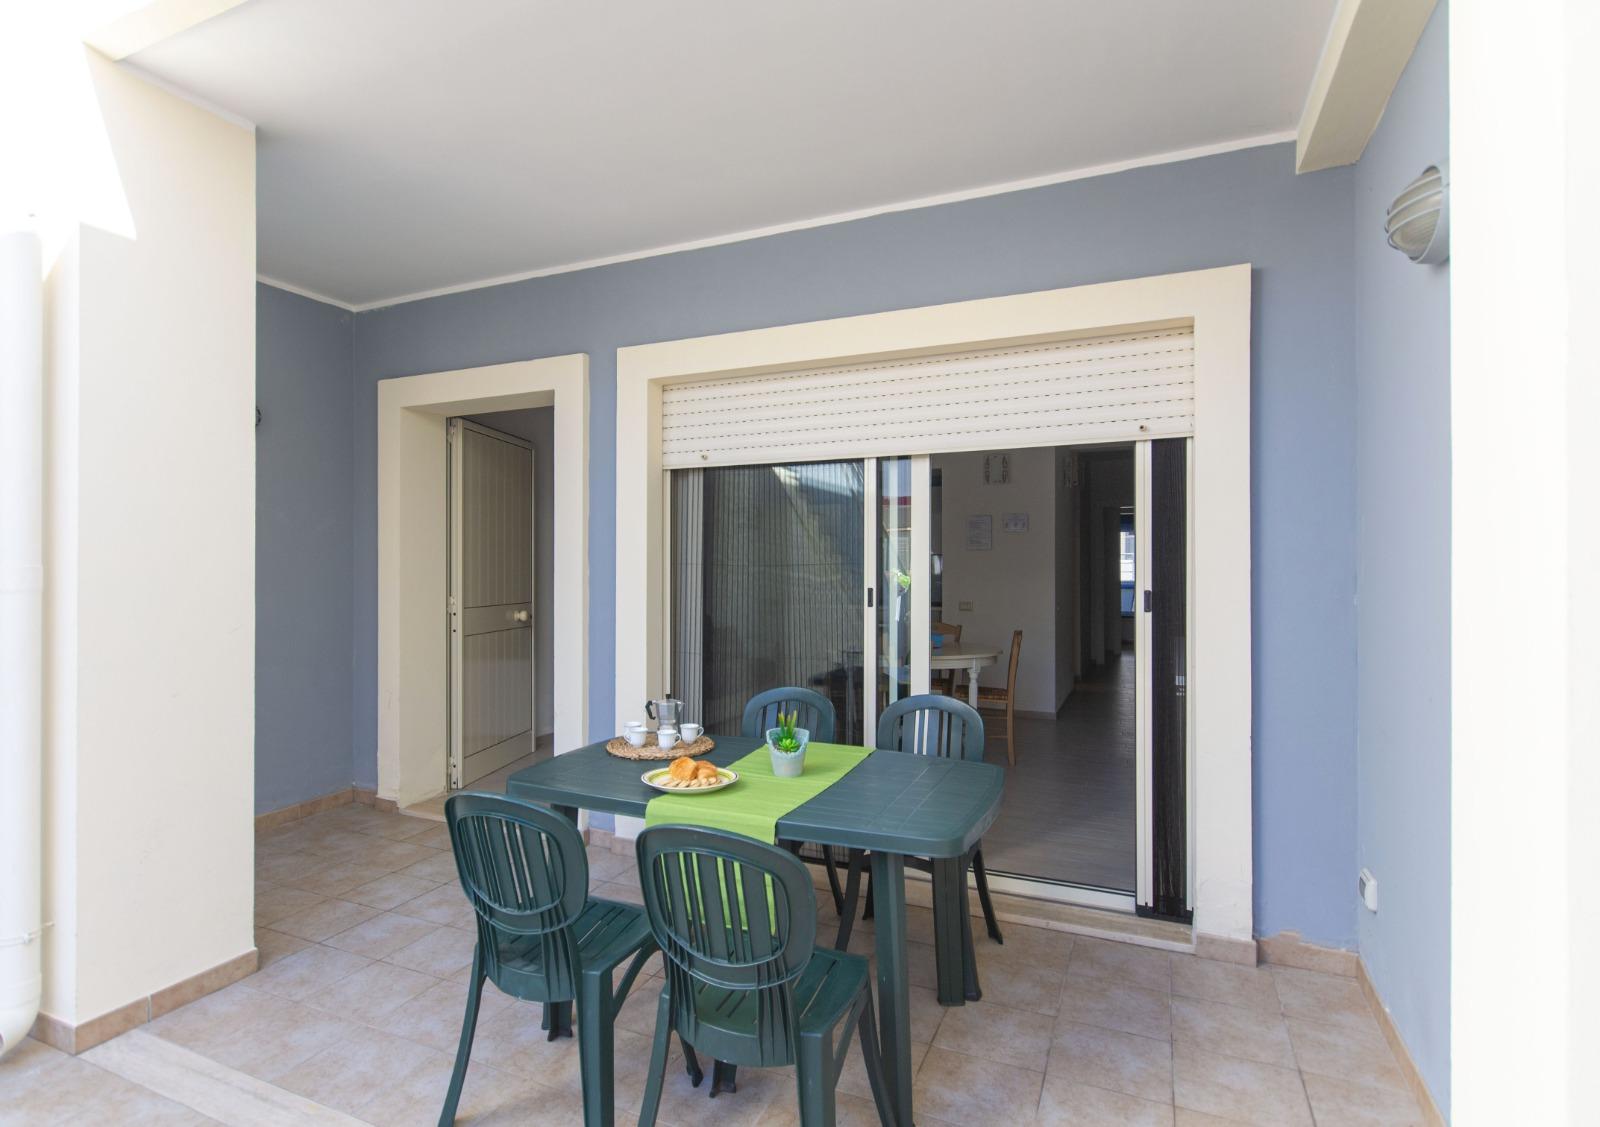 505_appartamento-volta_2._spazio_esterno.jpg